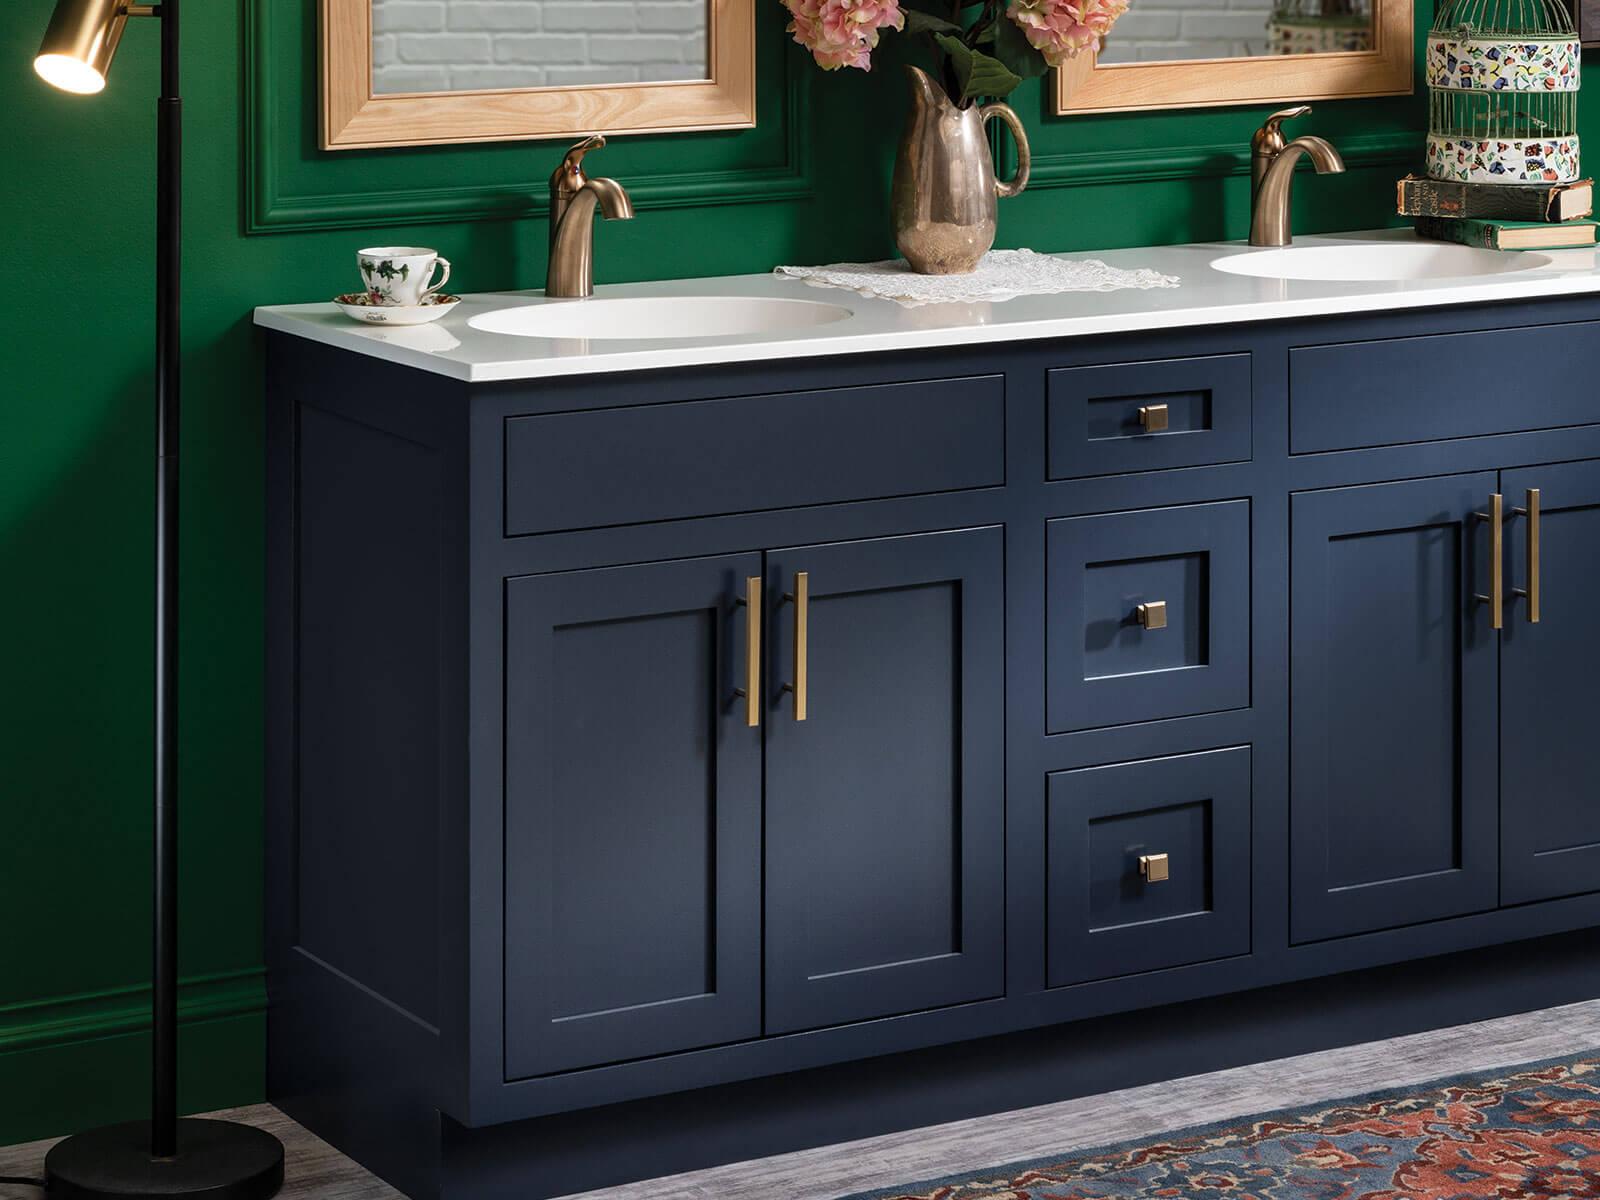 Decorative Hardware In Alsip, Bertch Bathroom Cabinets Reviews